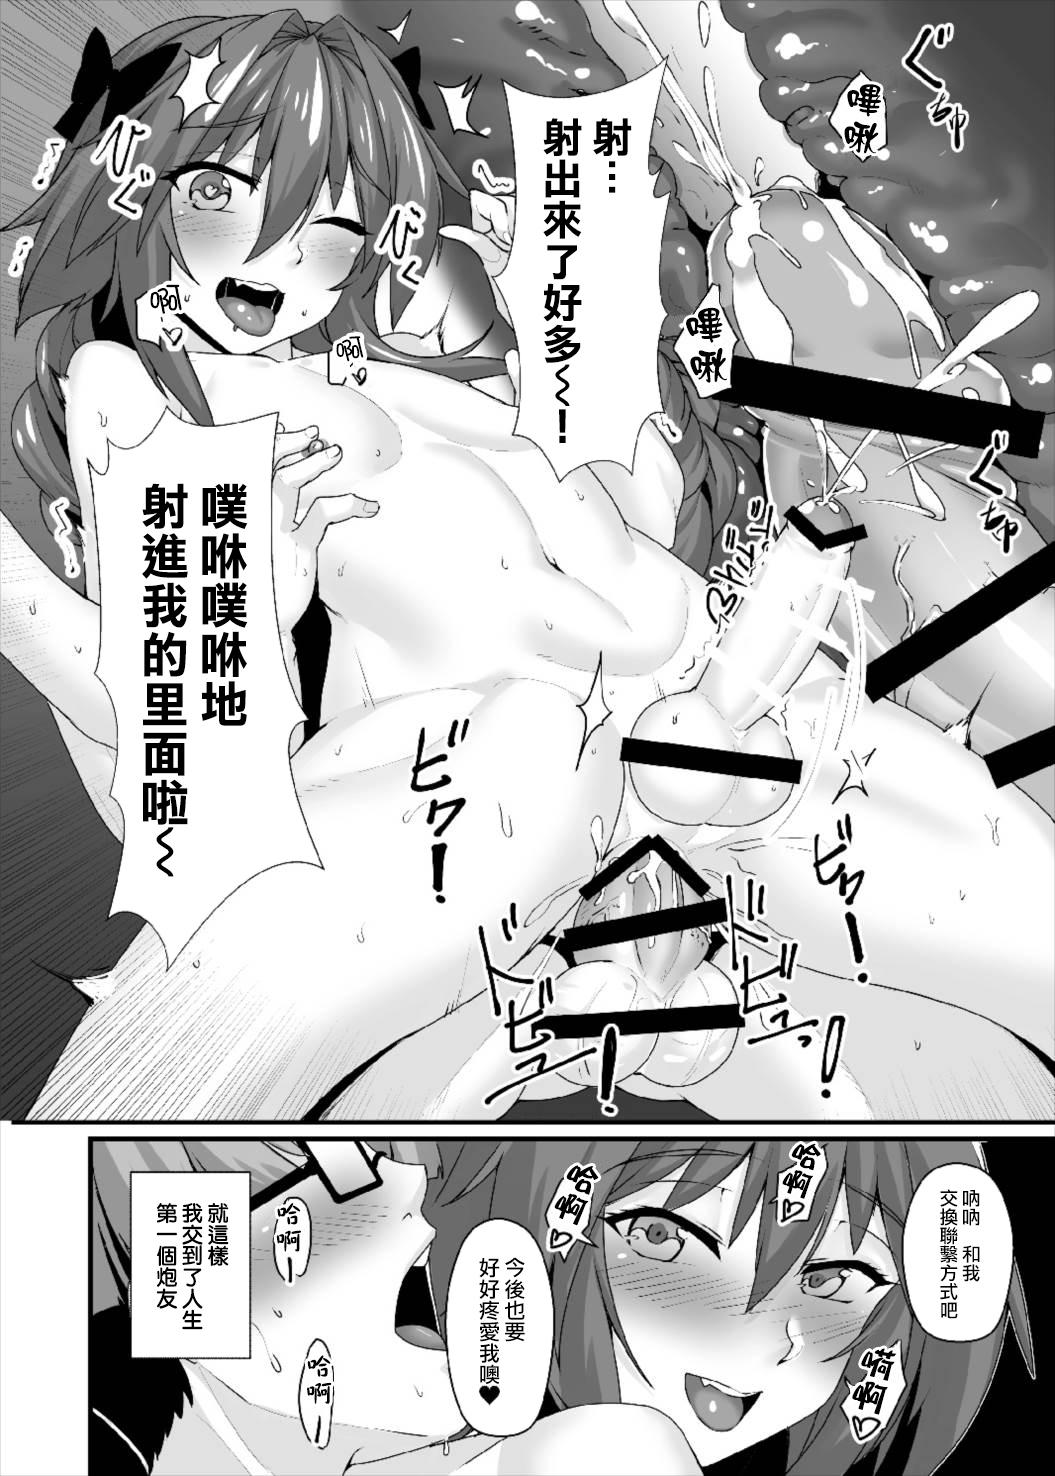 Konsui Rape! Yajuu to Kashita Camera Kozou | 昏睡凌辱!化身野獸的攝像師 14